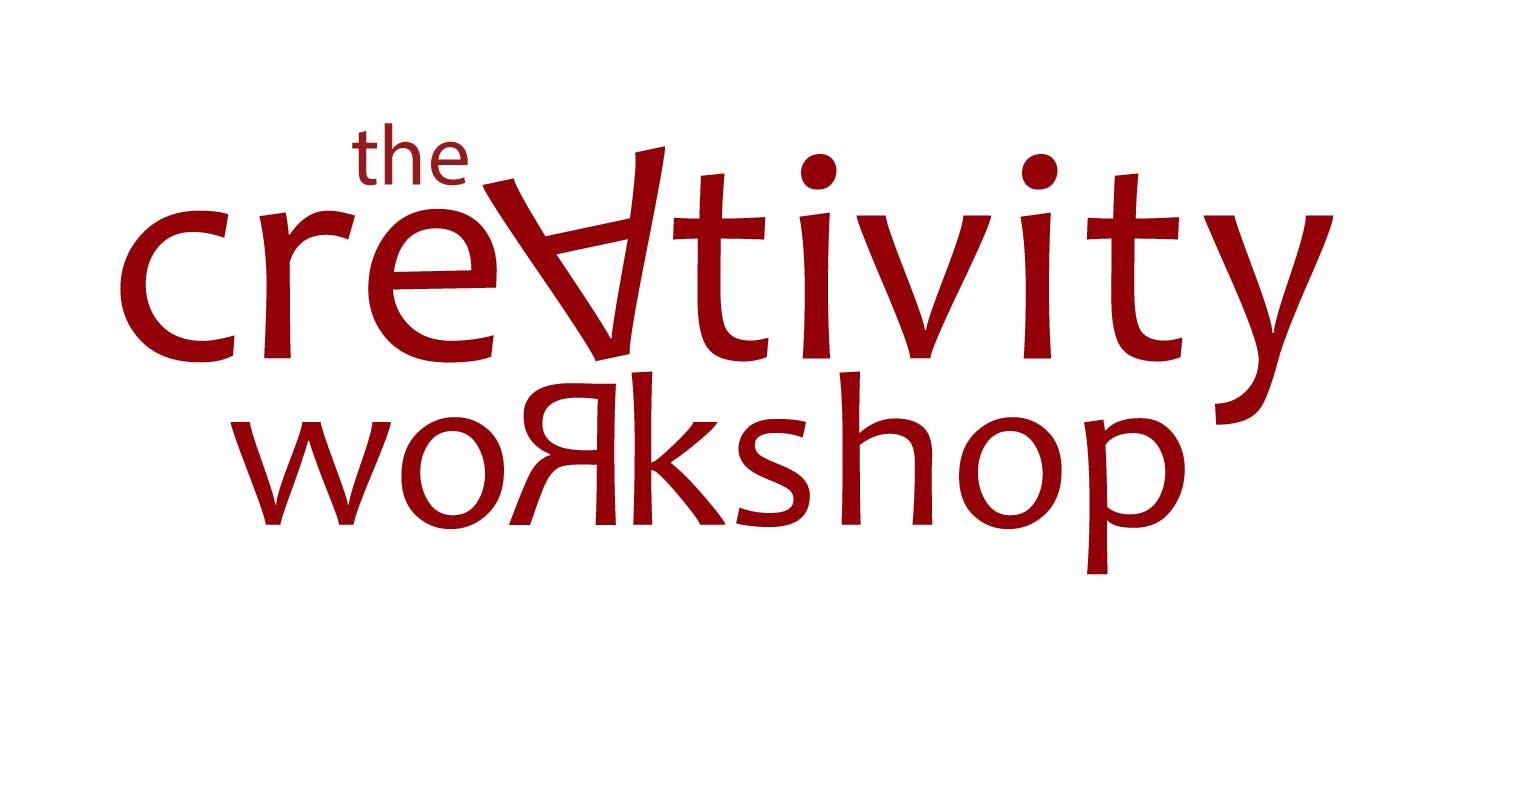 The Creativity Workshop in Crete - June 20 - 24 2018